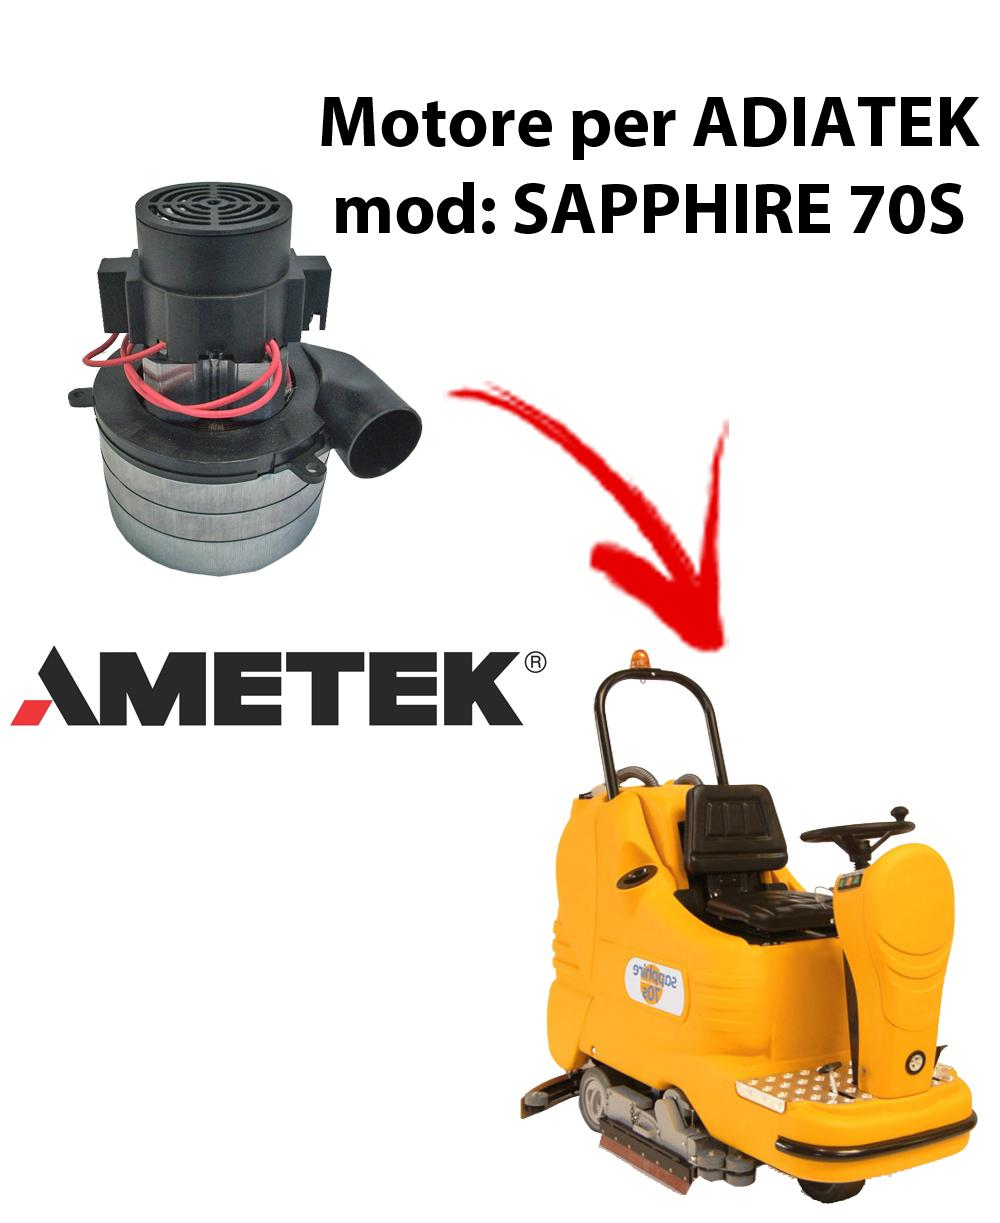 Sapphire 70S  Motore AMETEK ITALIA aspirazione per lavapavimenti Adiatek